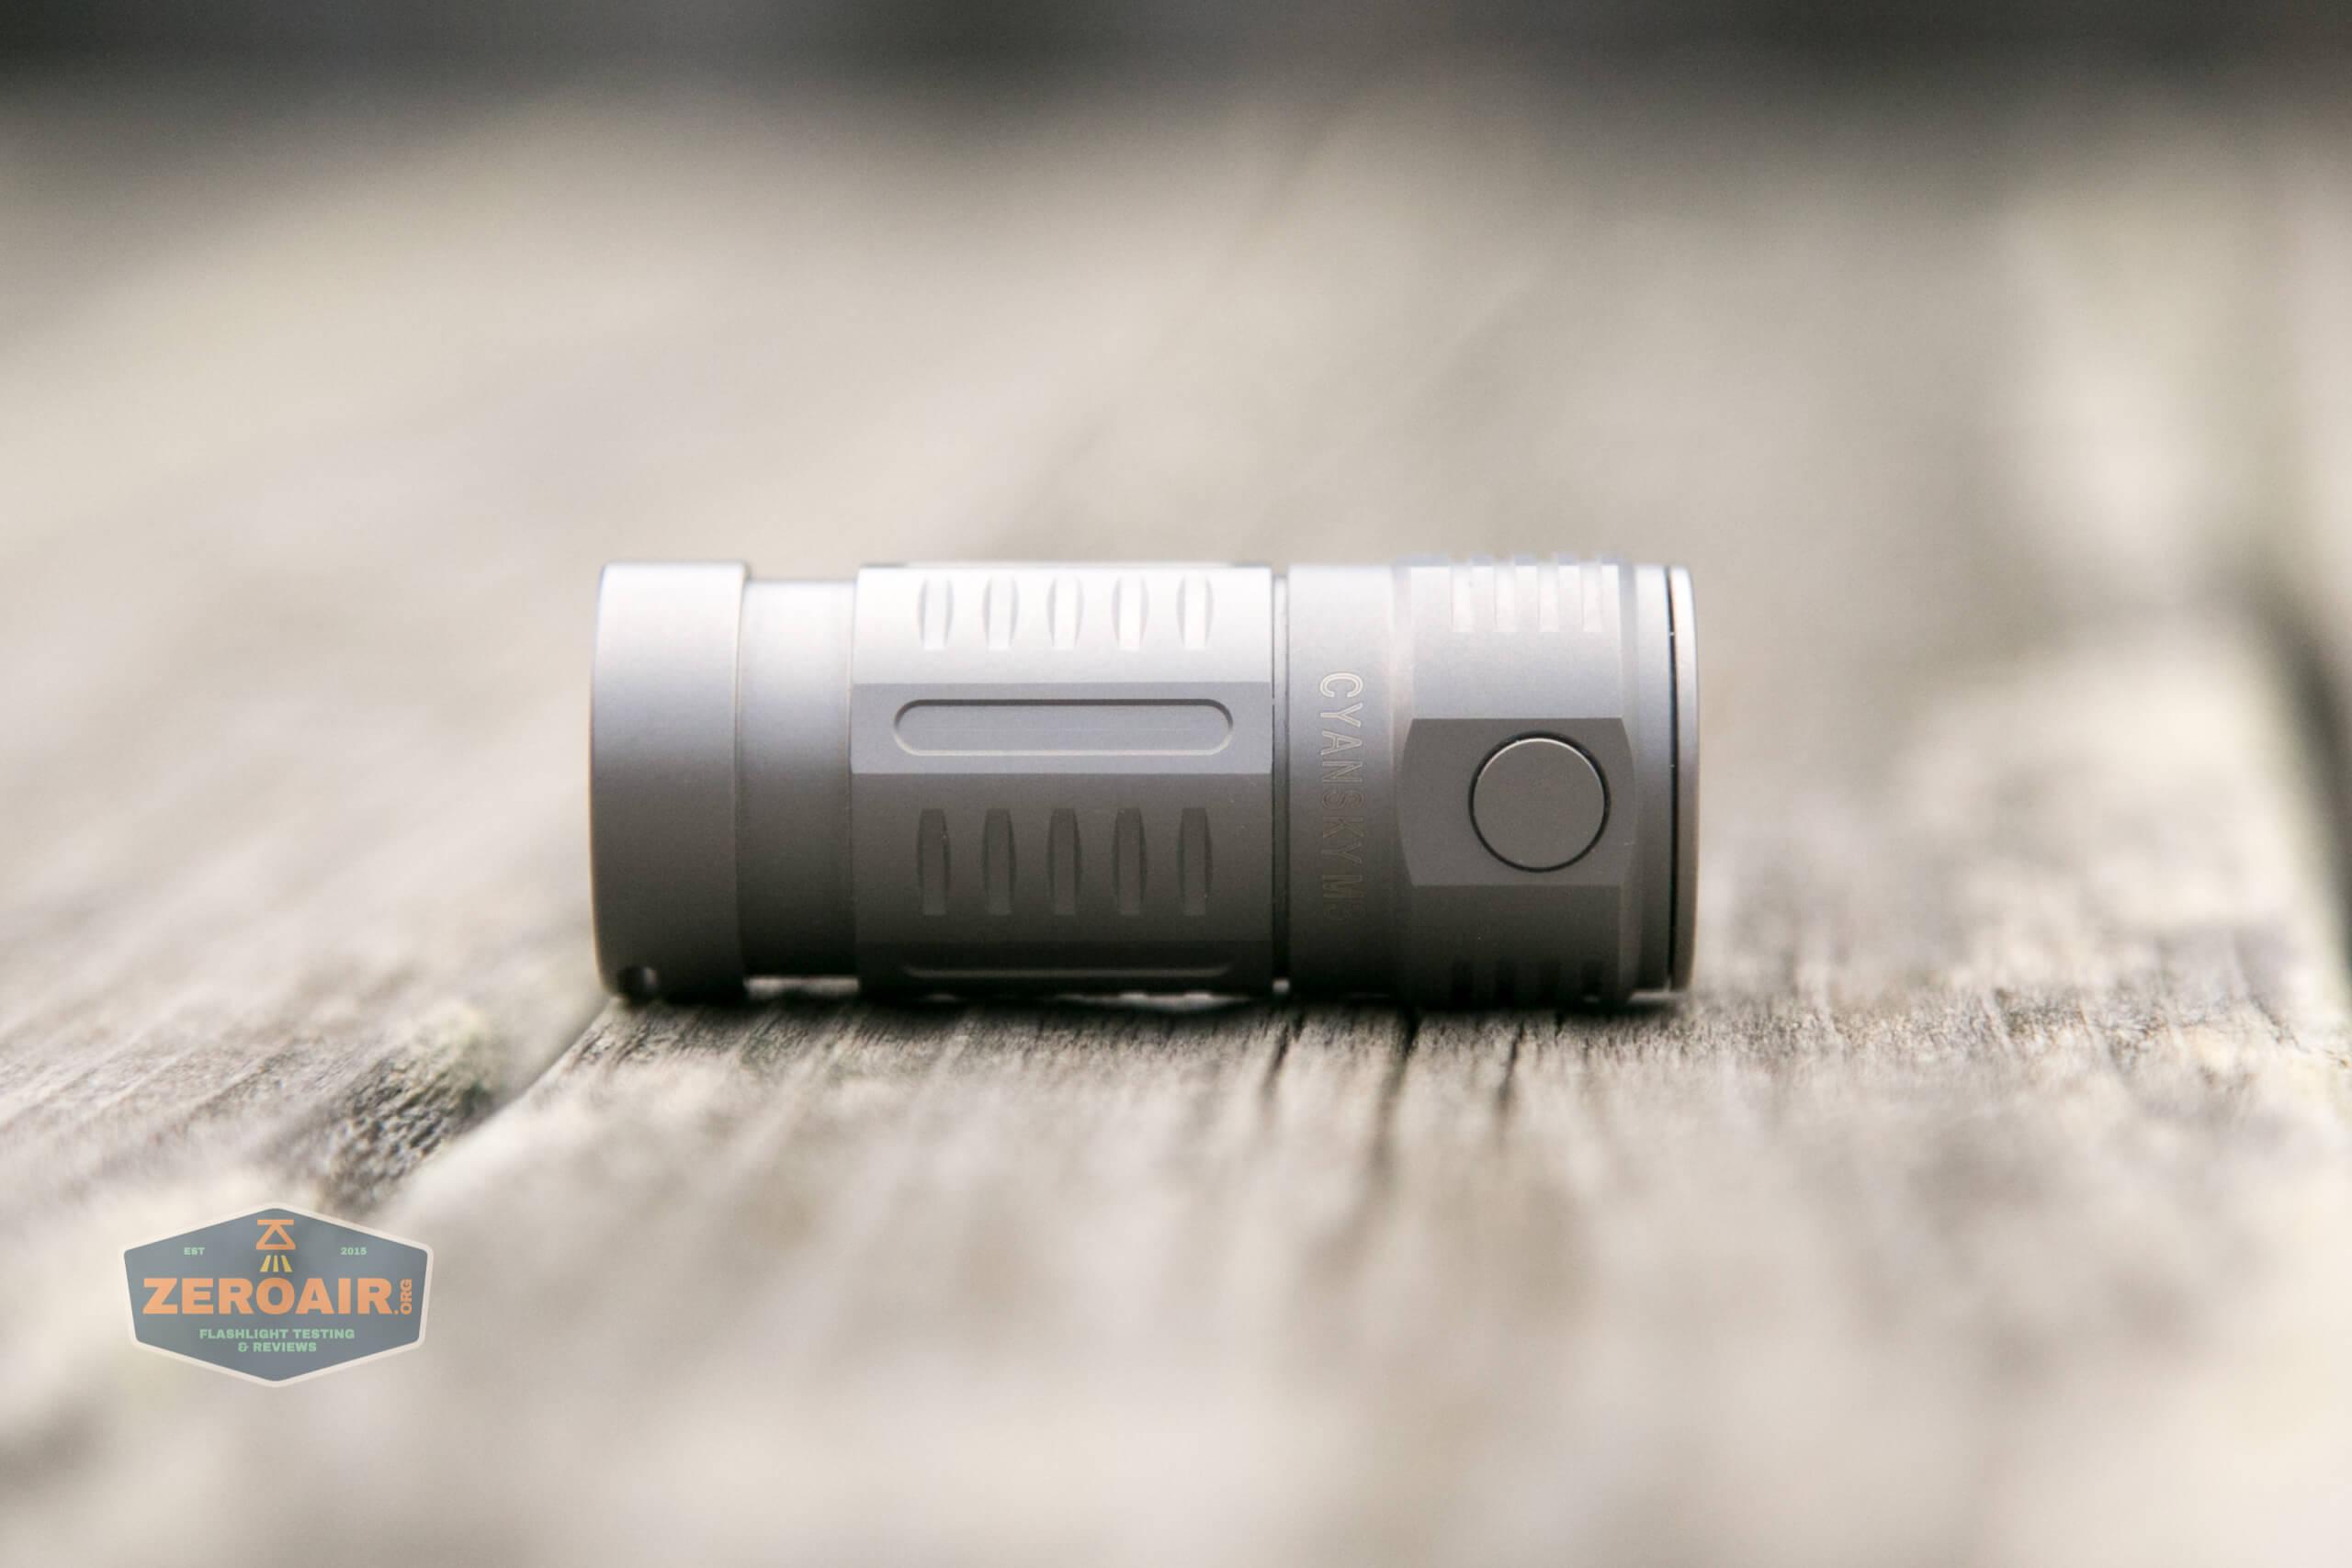 freasygears cyansky m3 titanium pocket flashlight on side